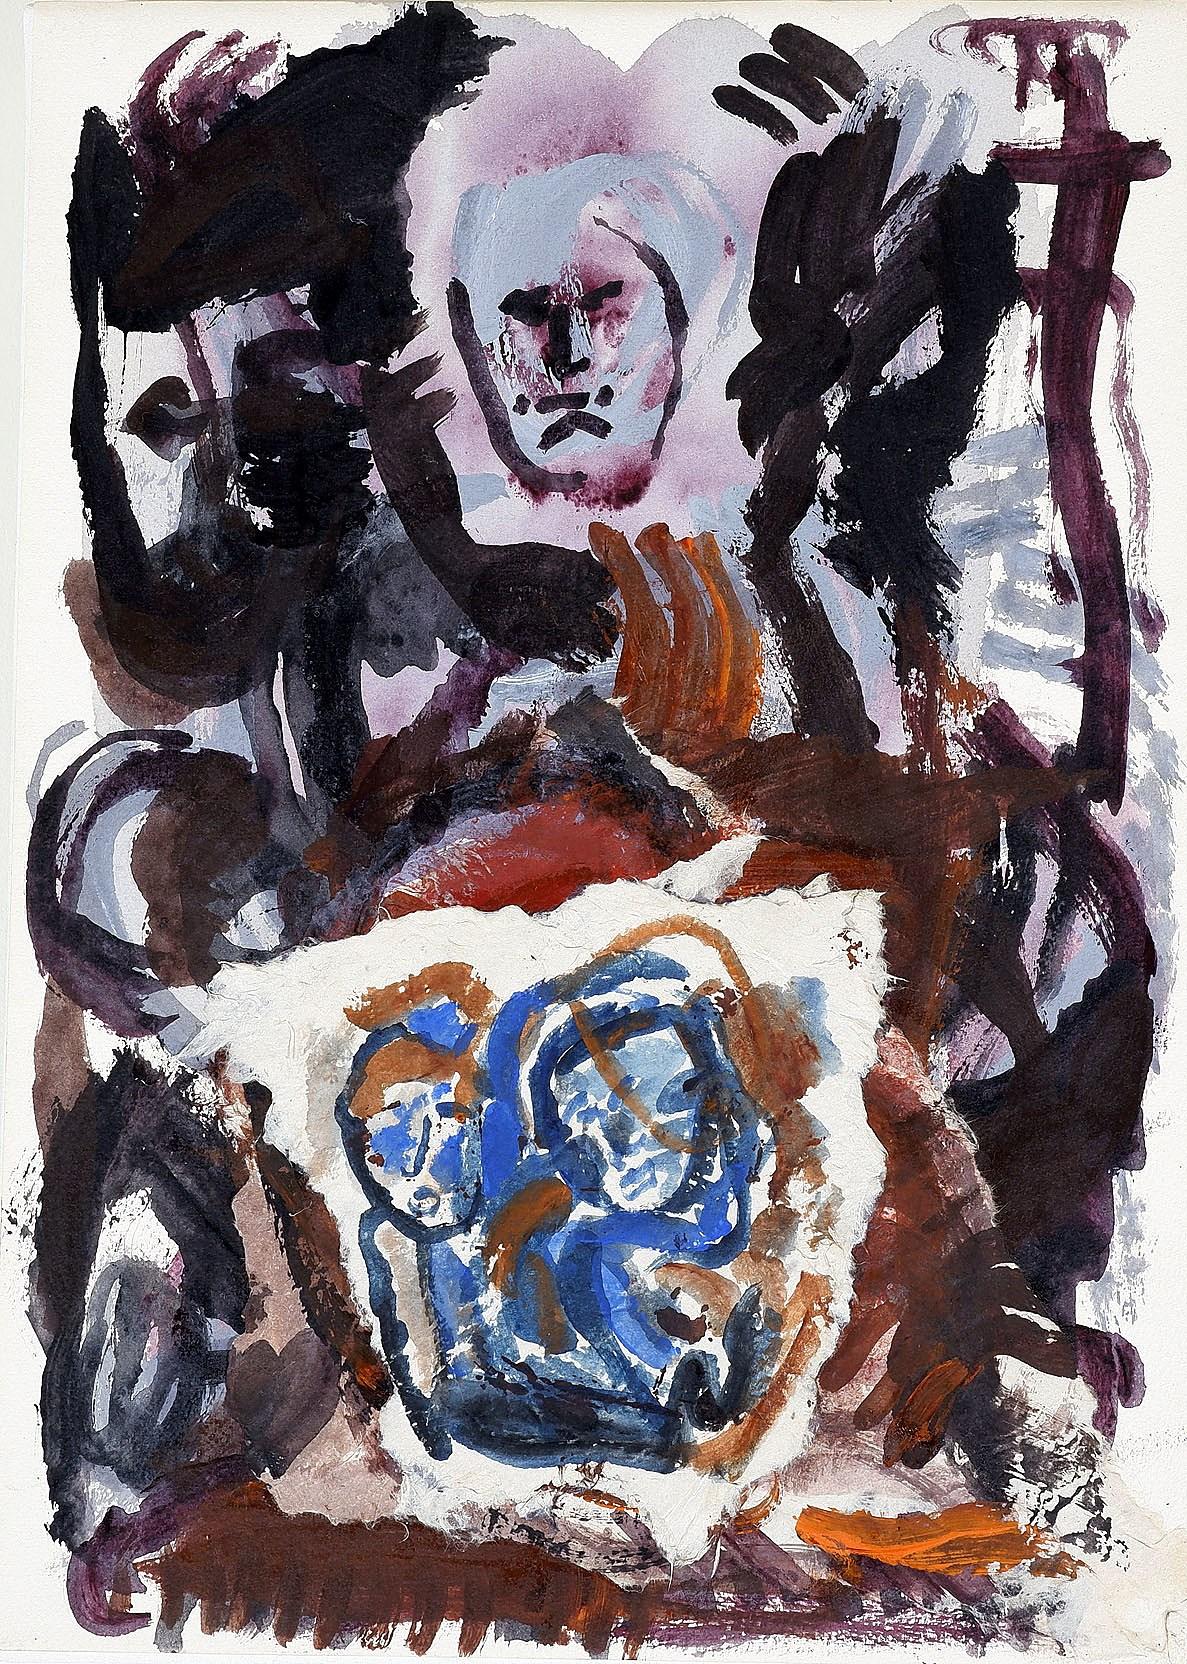 'Vivienne Dadour (b. 1953) Remnants #4 Paris 1996, Collage and Mixed Media'